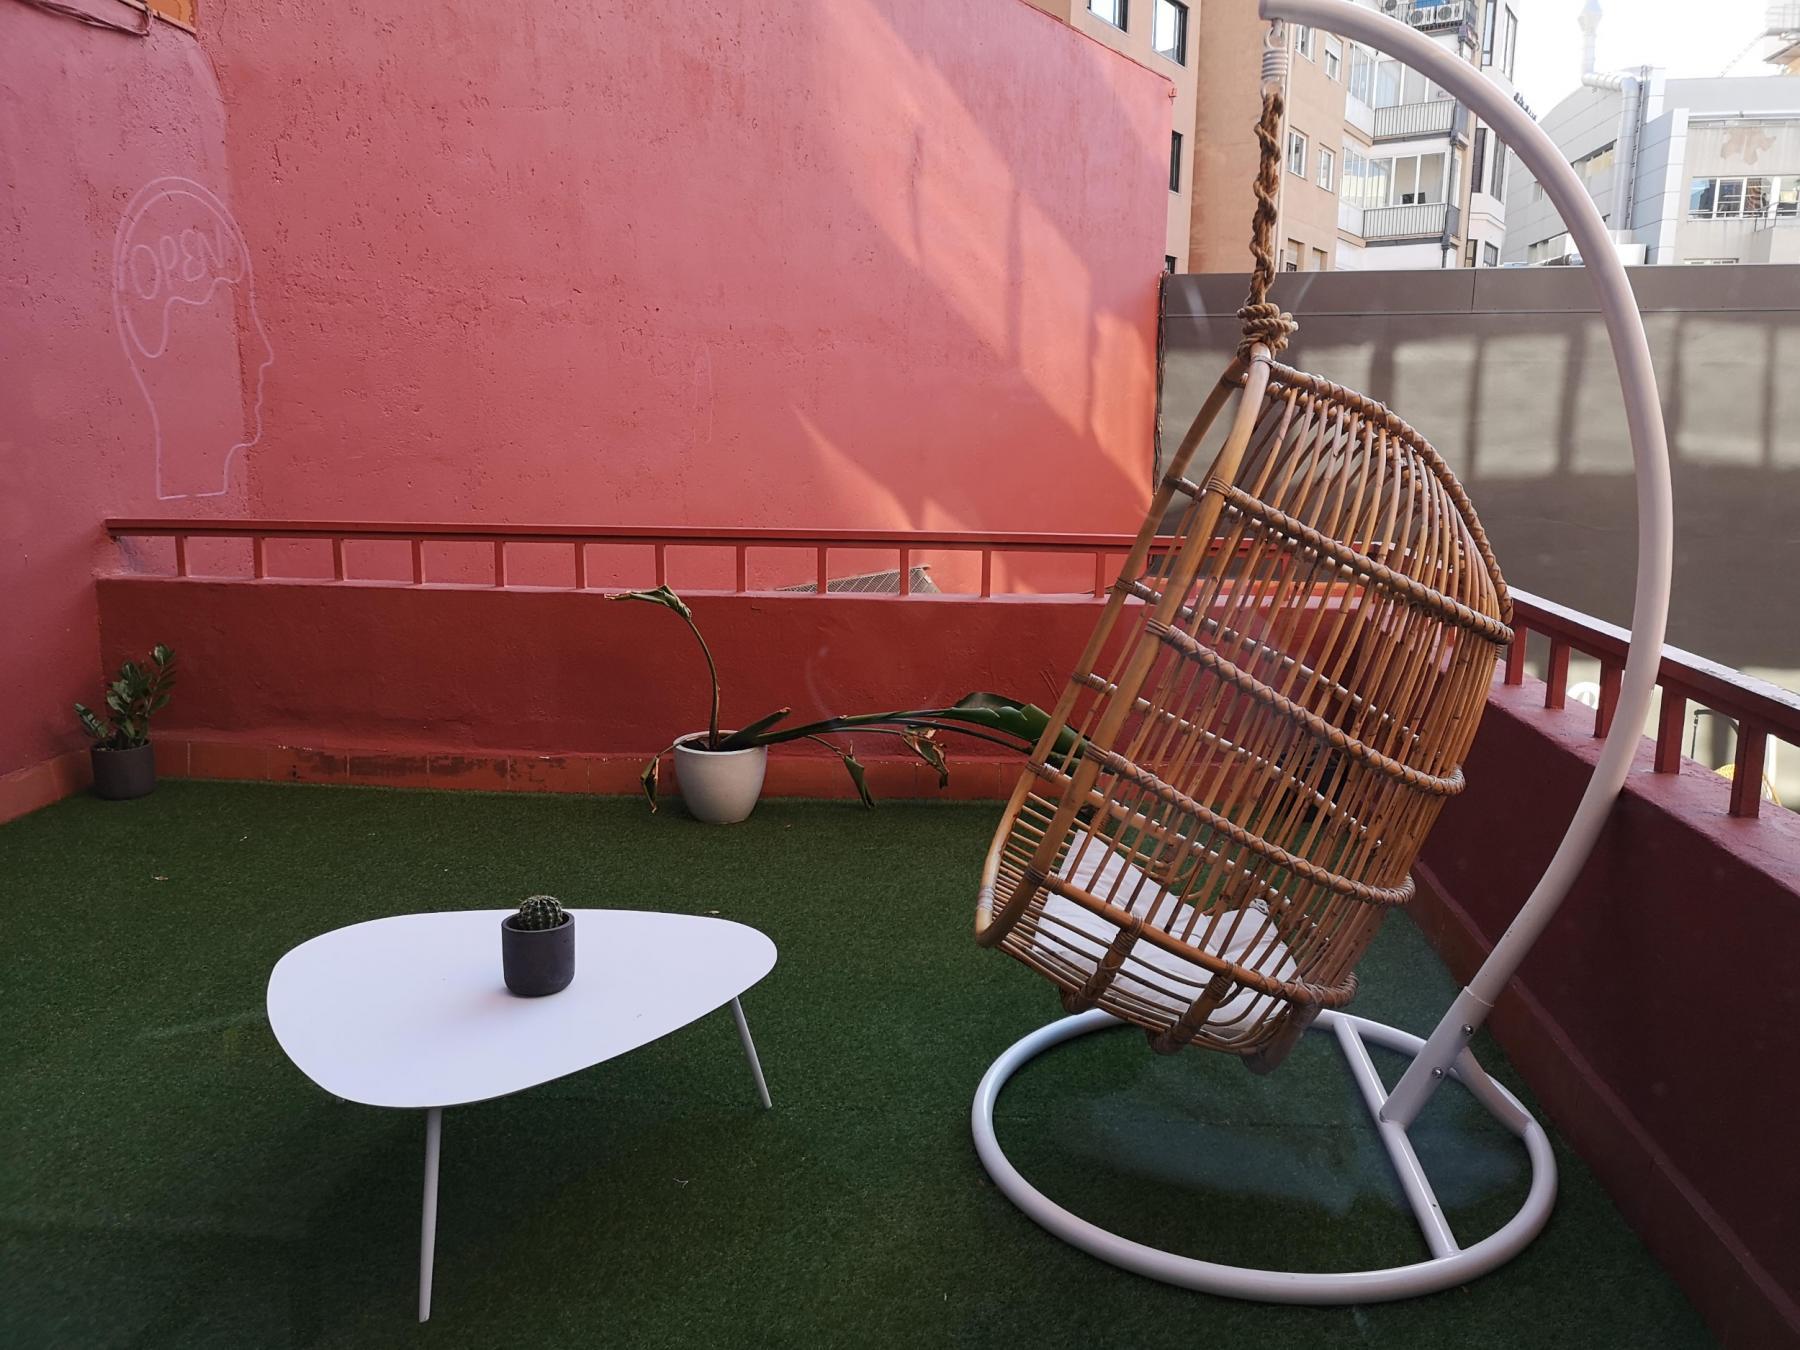 Alquilar oficinas Riera de Sant Miquel 1, Barcelona (11)